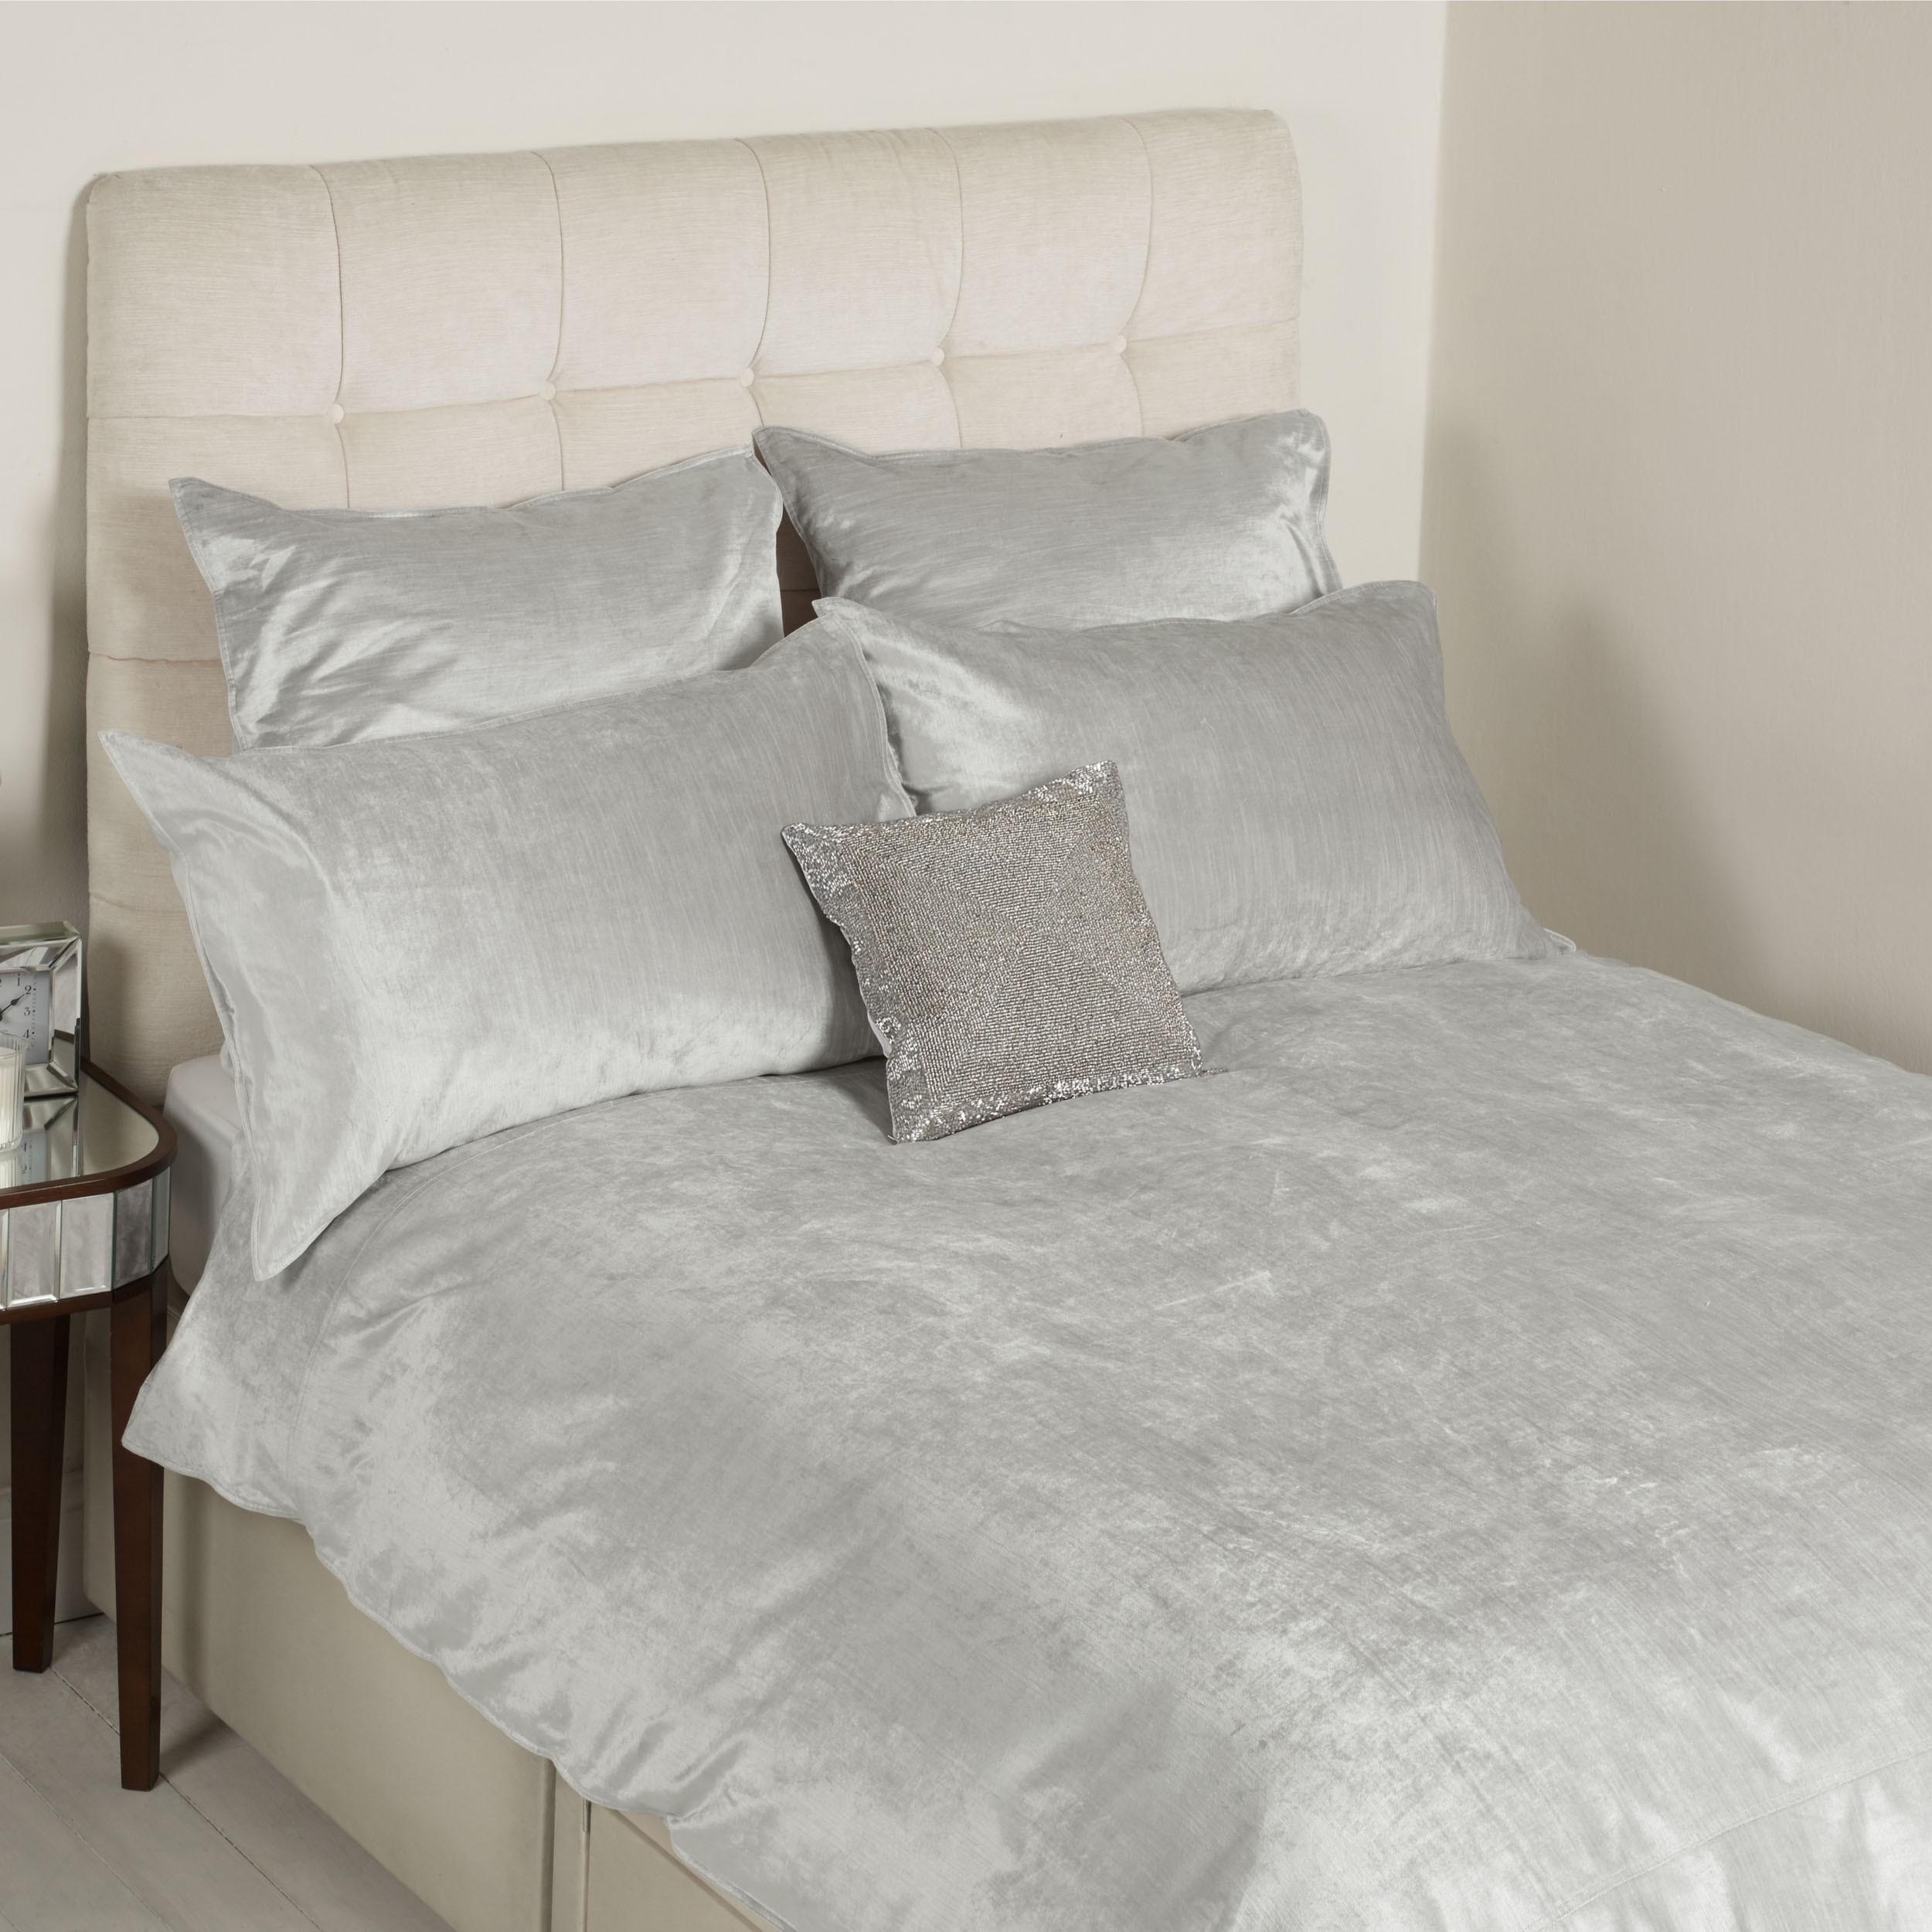 Comprar ropa de cama Alana terciopelo plata de diseño - Laura Ashley ...